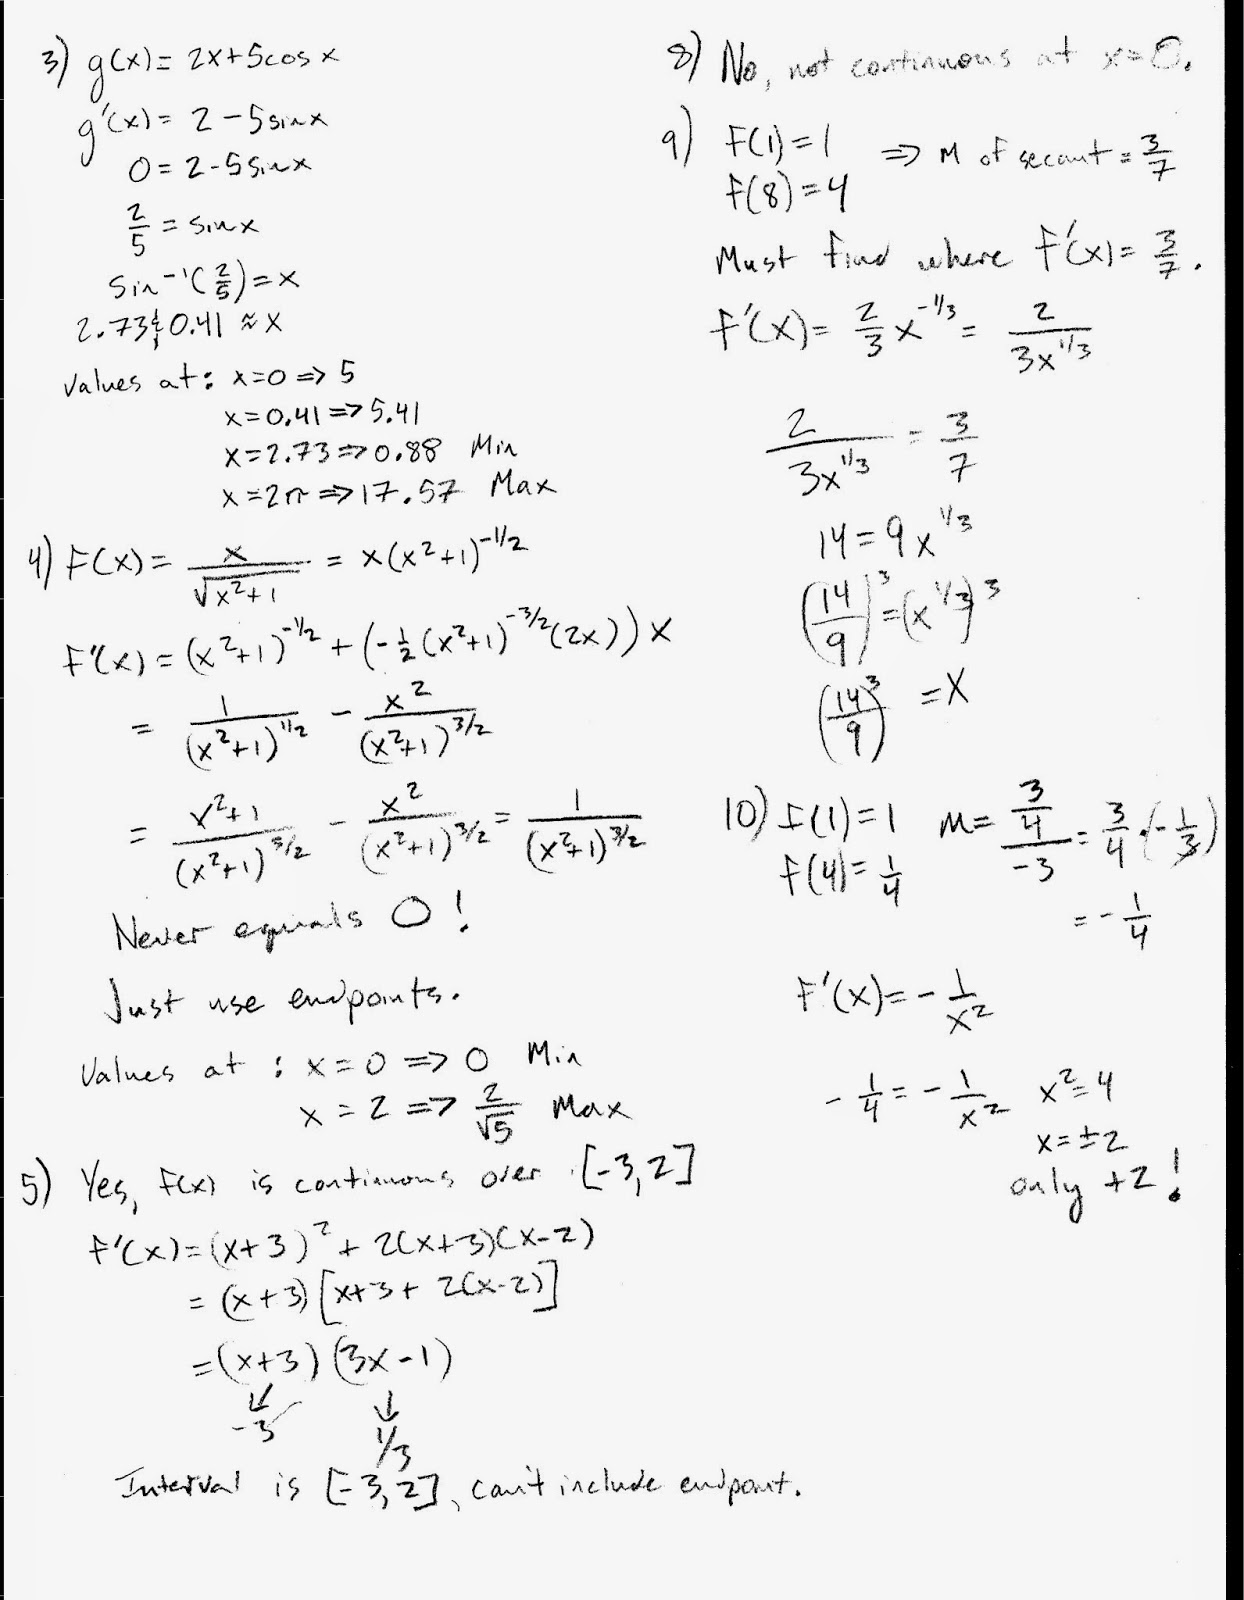 AP%2BCalc%2BChapter%2B3%2BReview%2BANS%2BPt%2B1 math problems calculus aprita com on quadratic word problems worksheet answers